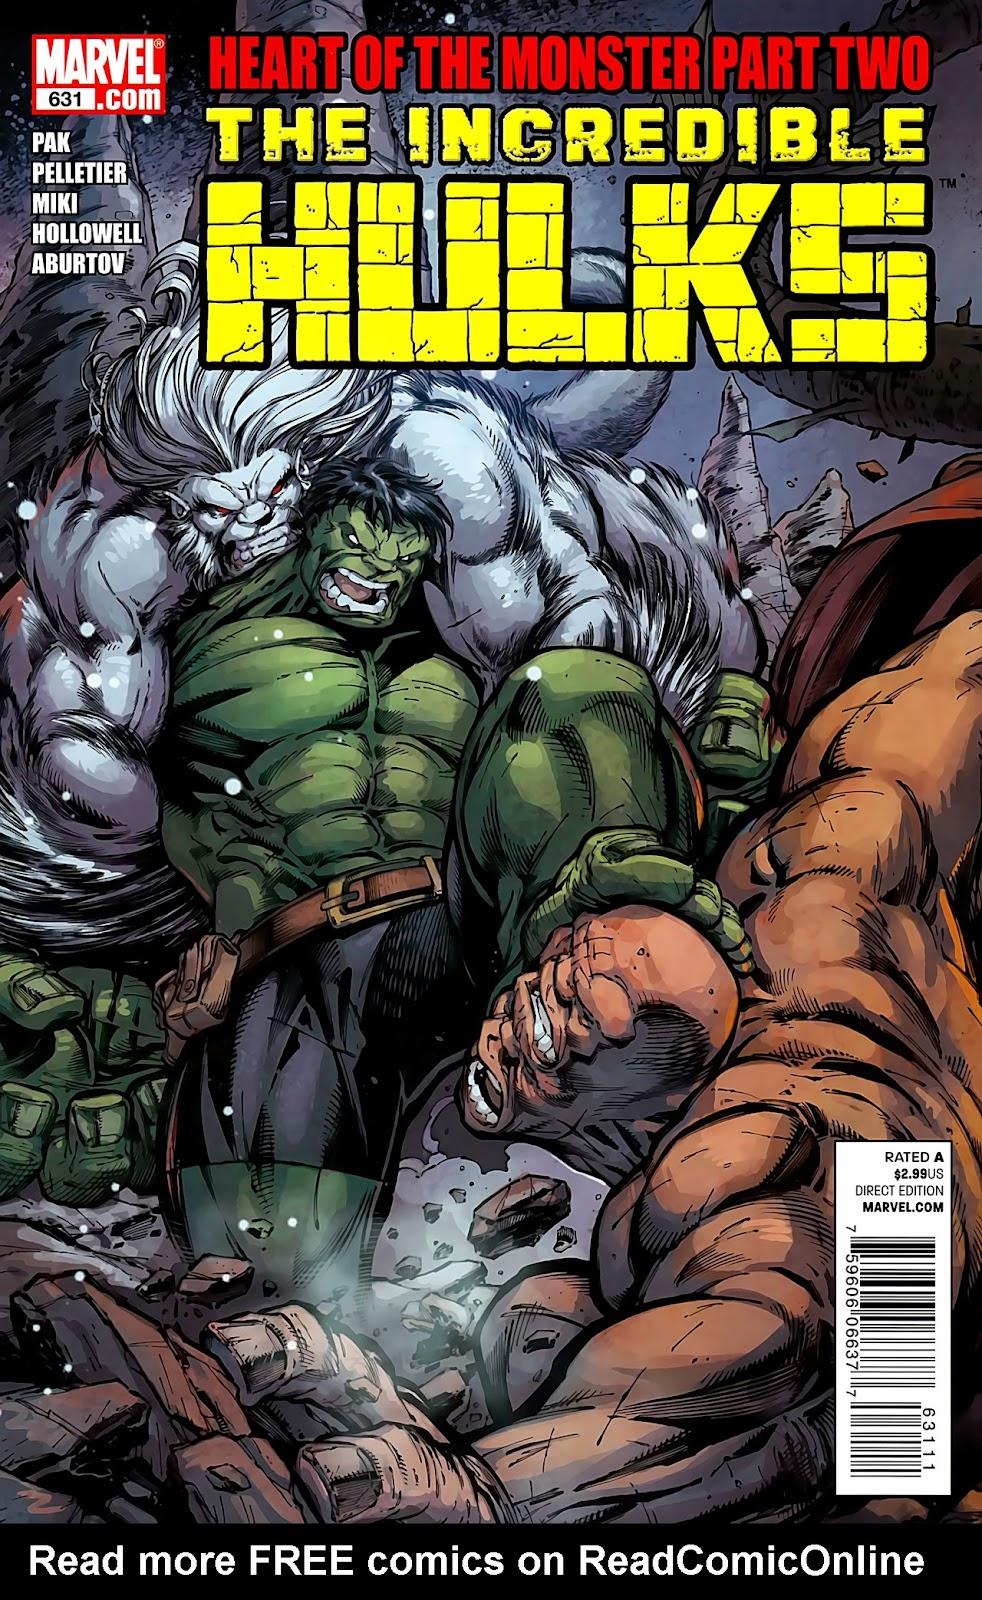 Incredible Hulks (2010) Issue #631 #21 - English 1